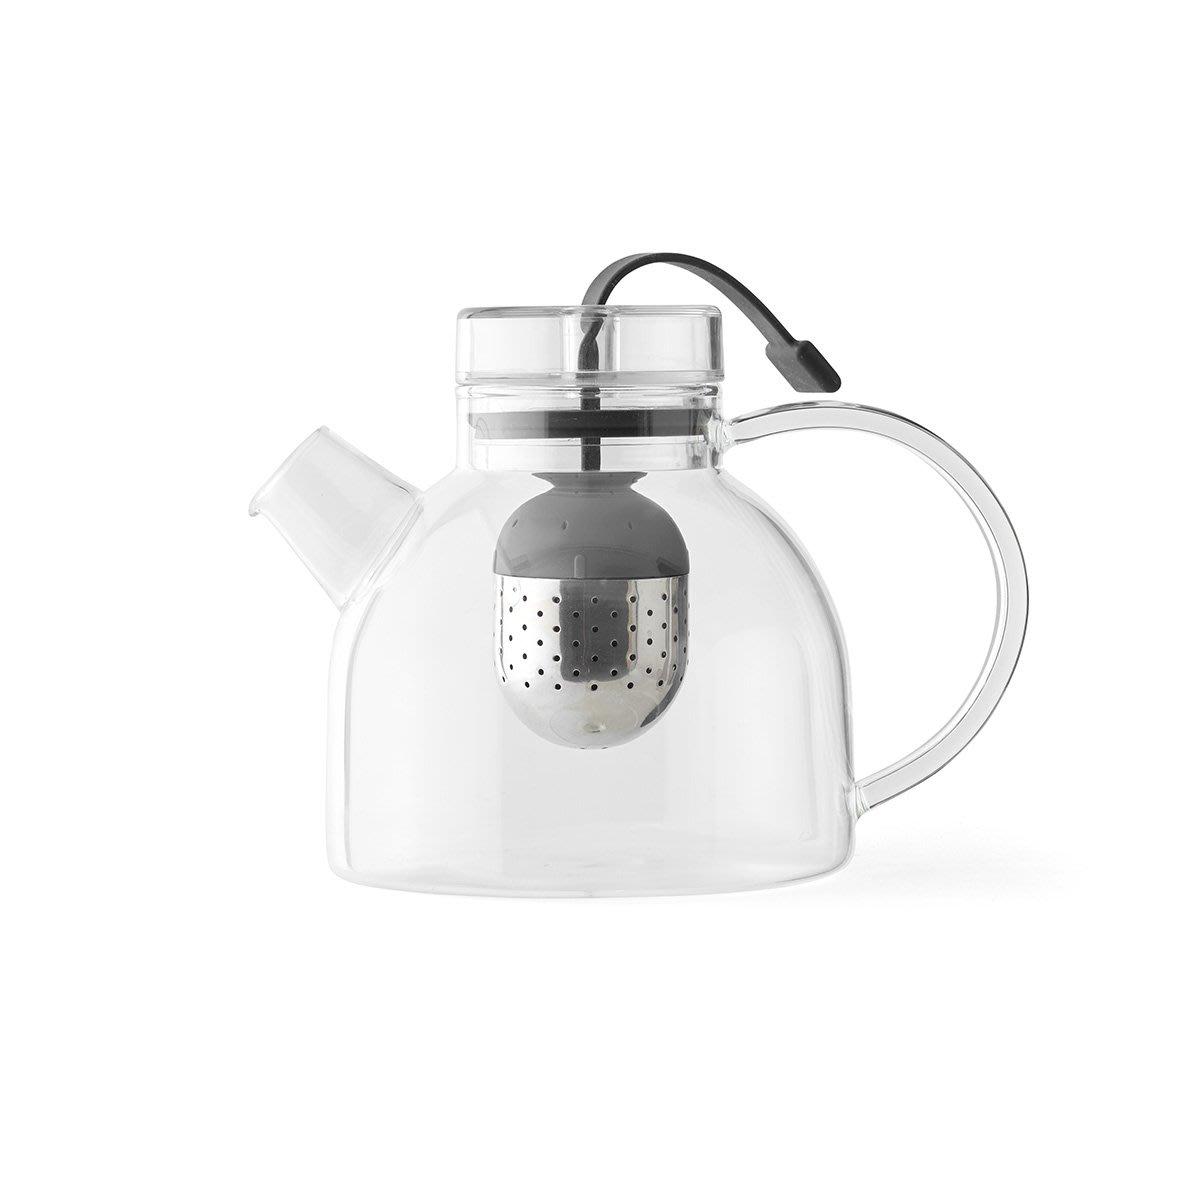 Luxury Life【正品】丹麥 Menu Kettle Tea Pot 0.75L 玻璃茶壺 - 小尺寸